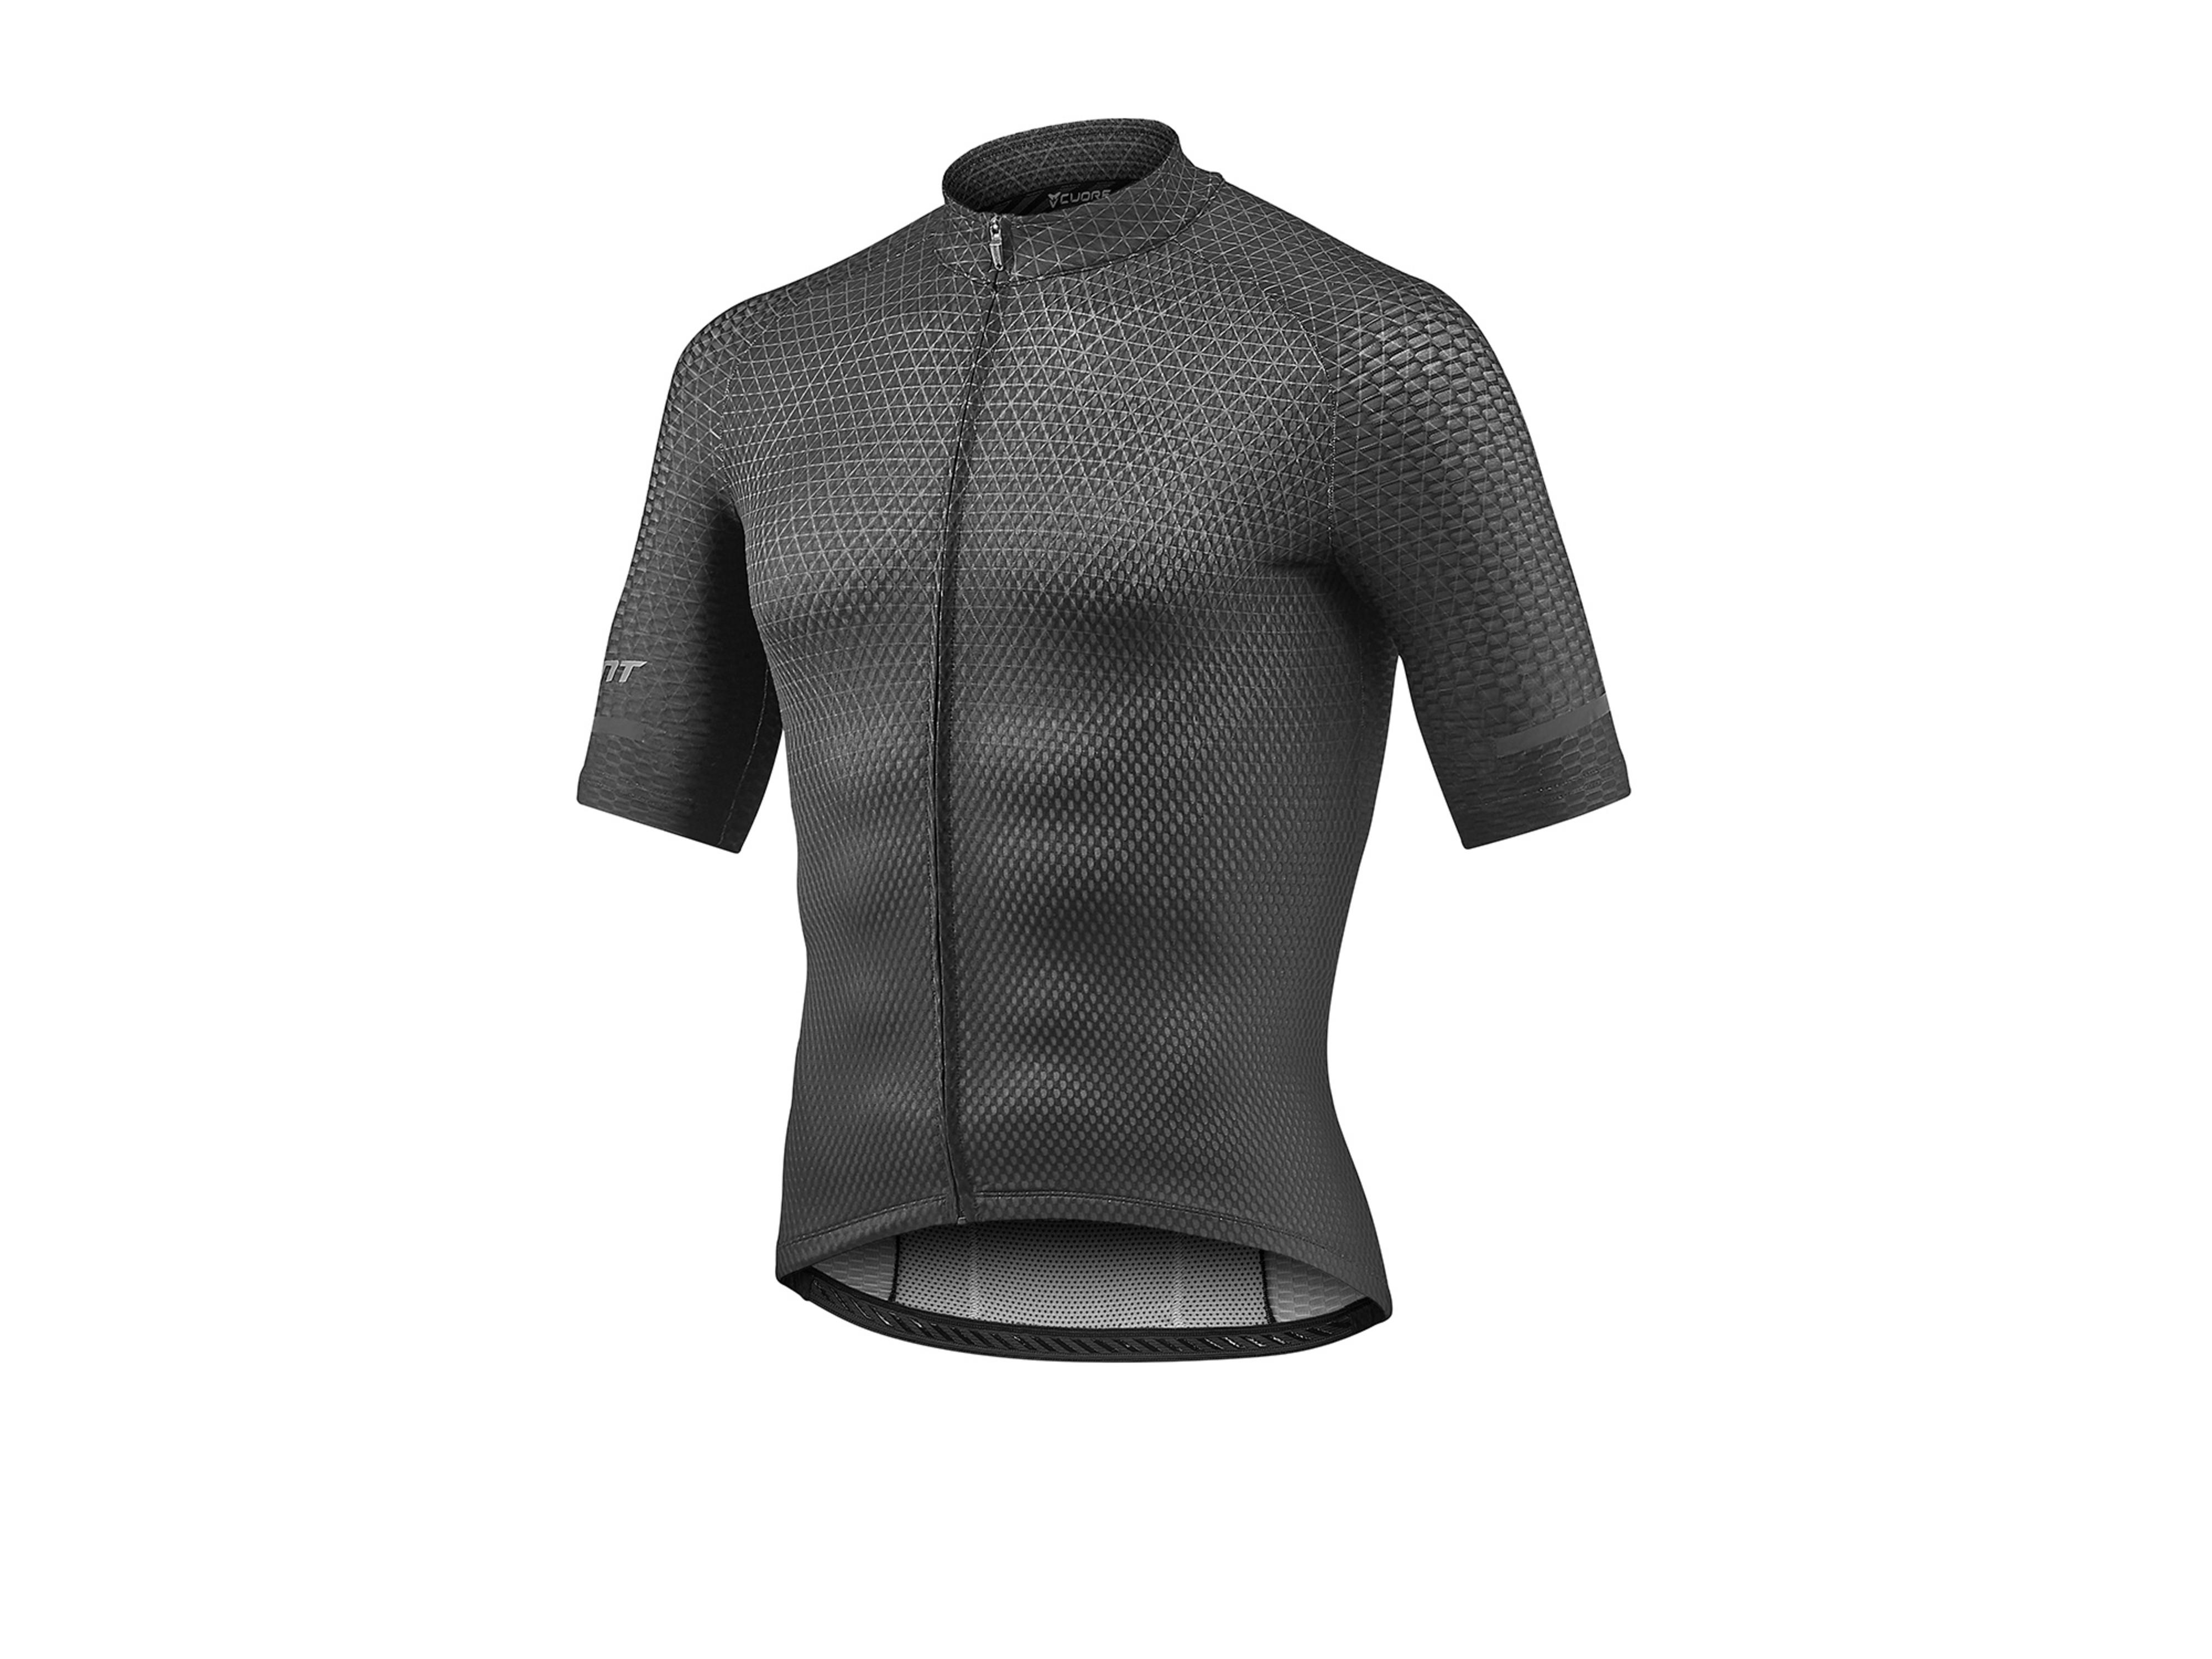 Campagnolo Quarzo Grey Cycling Jersey RRP £96.99